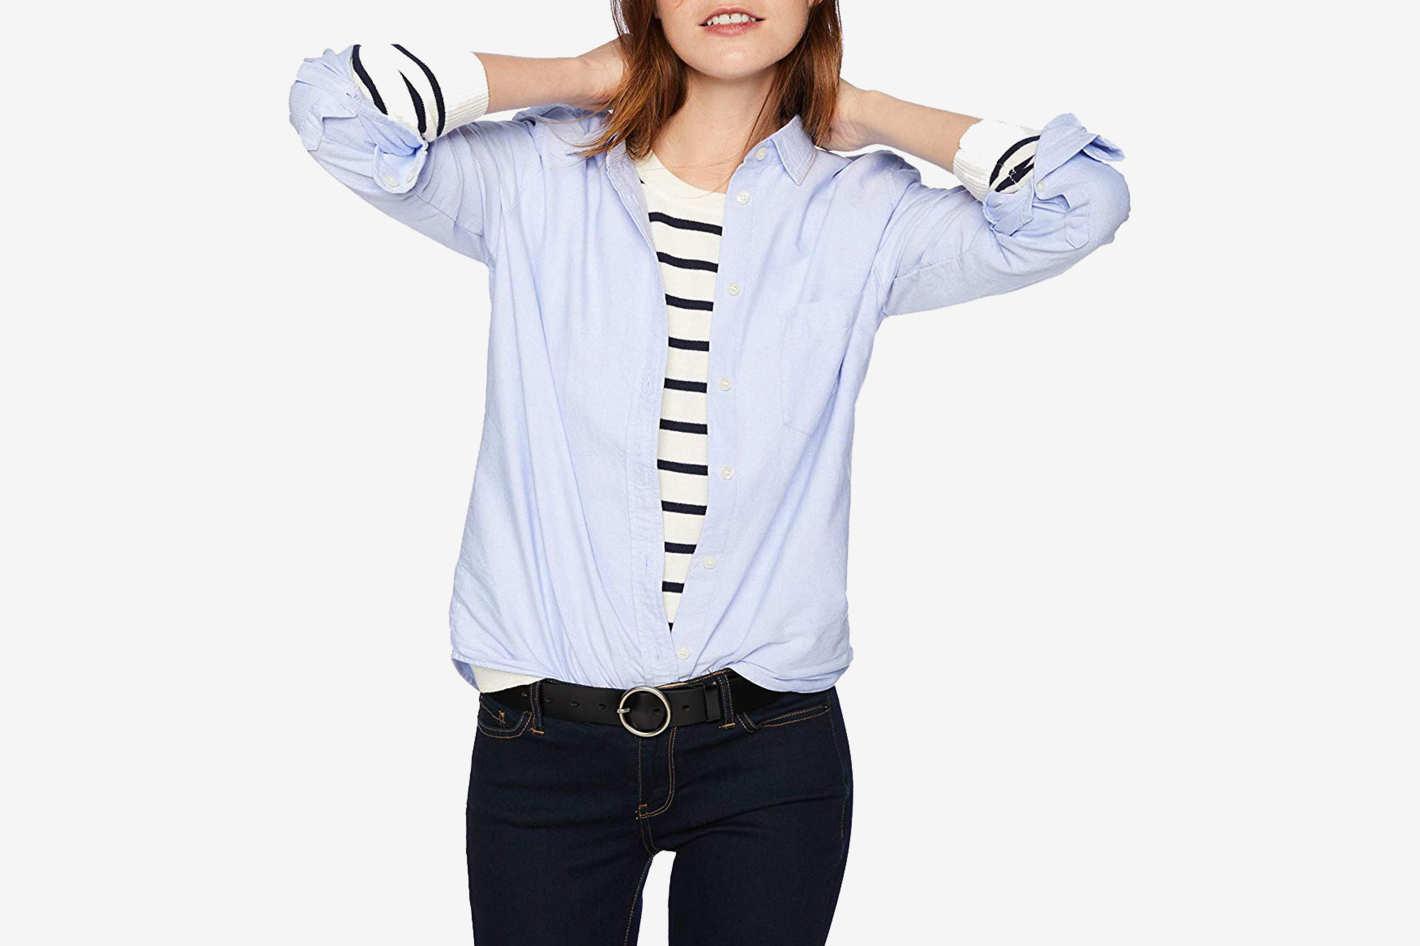 J.Crew Mercantile Women's Oxford Button Down Shirt